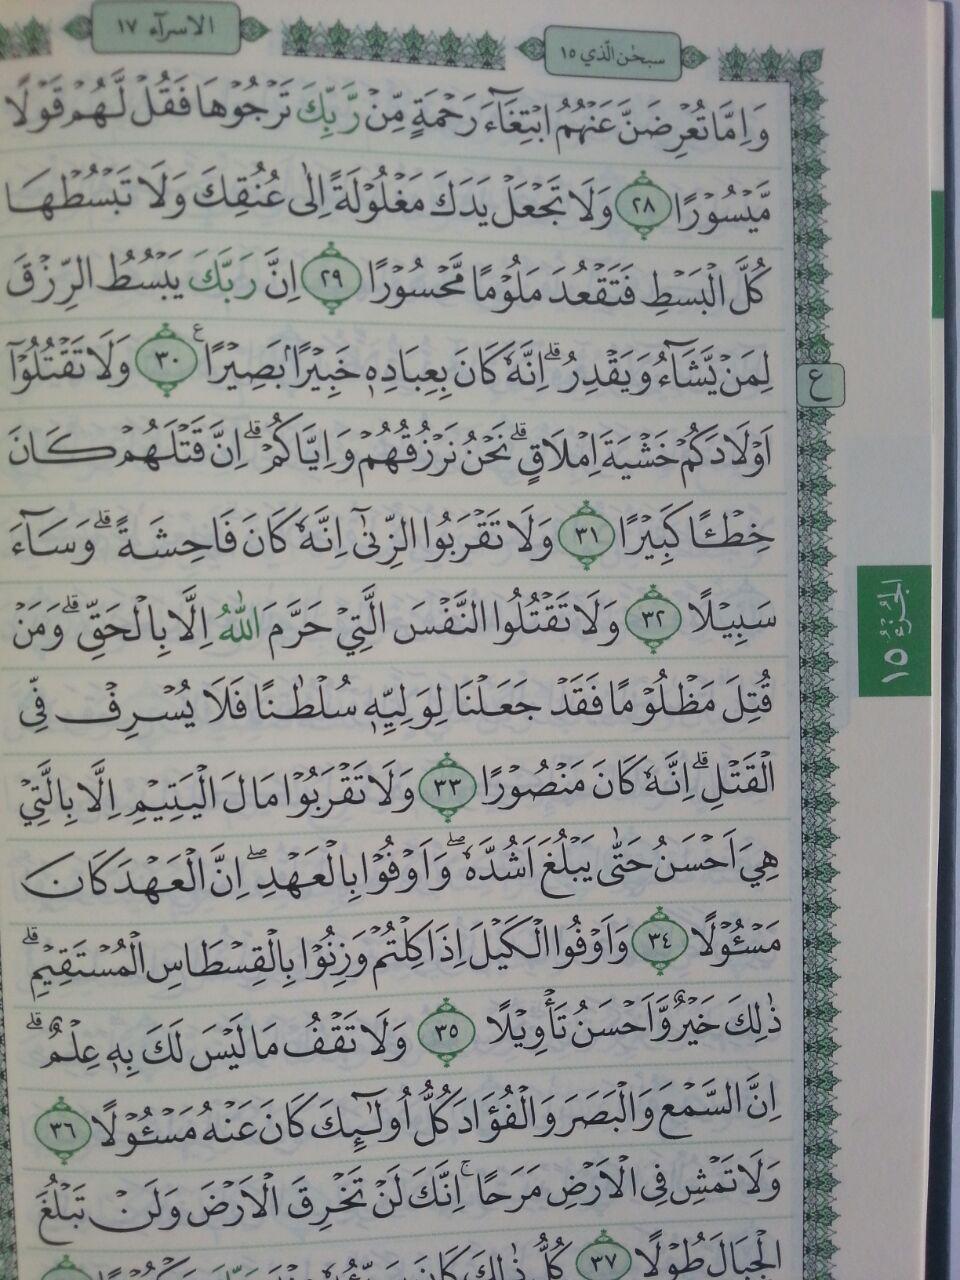 Al-Qur'an Al-Wafa' Mushaf Tanpa Terjemah Ukuran A5 isi 2